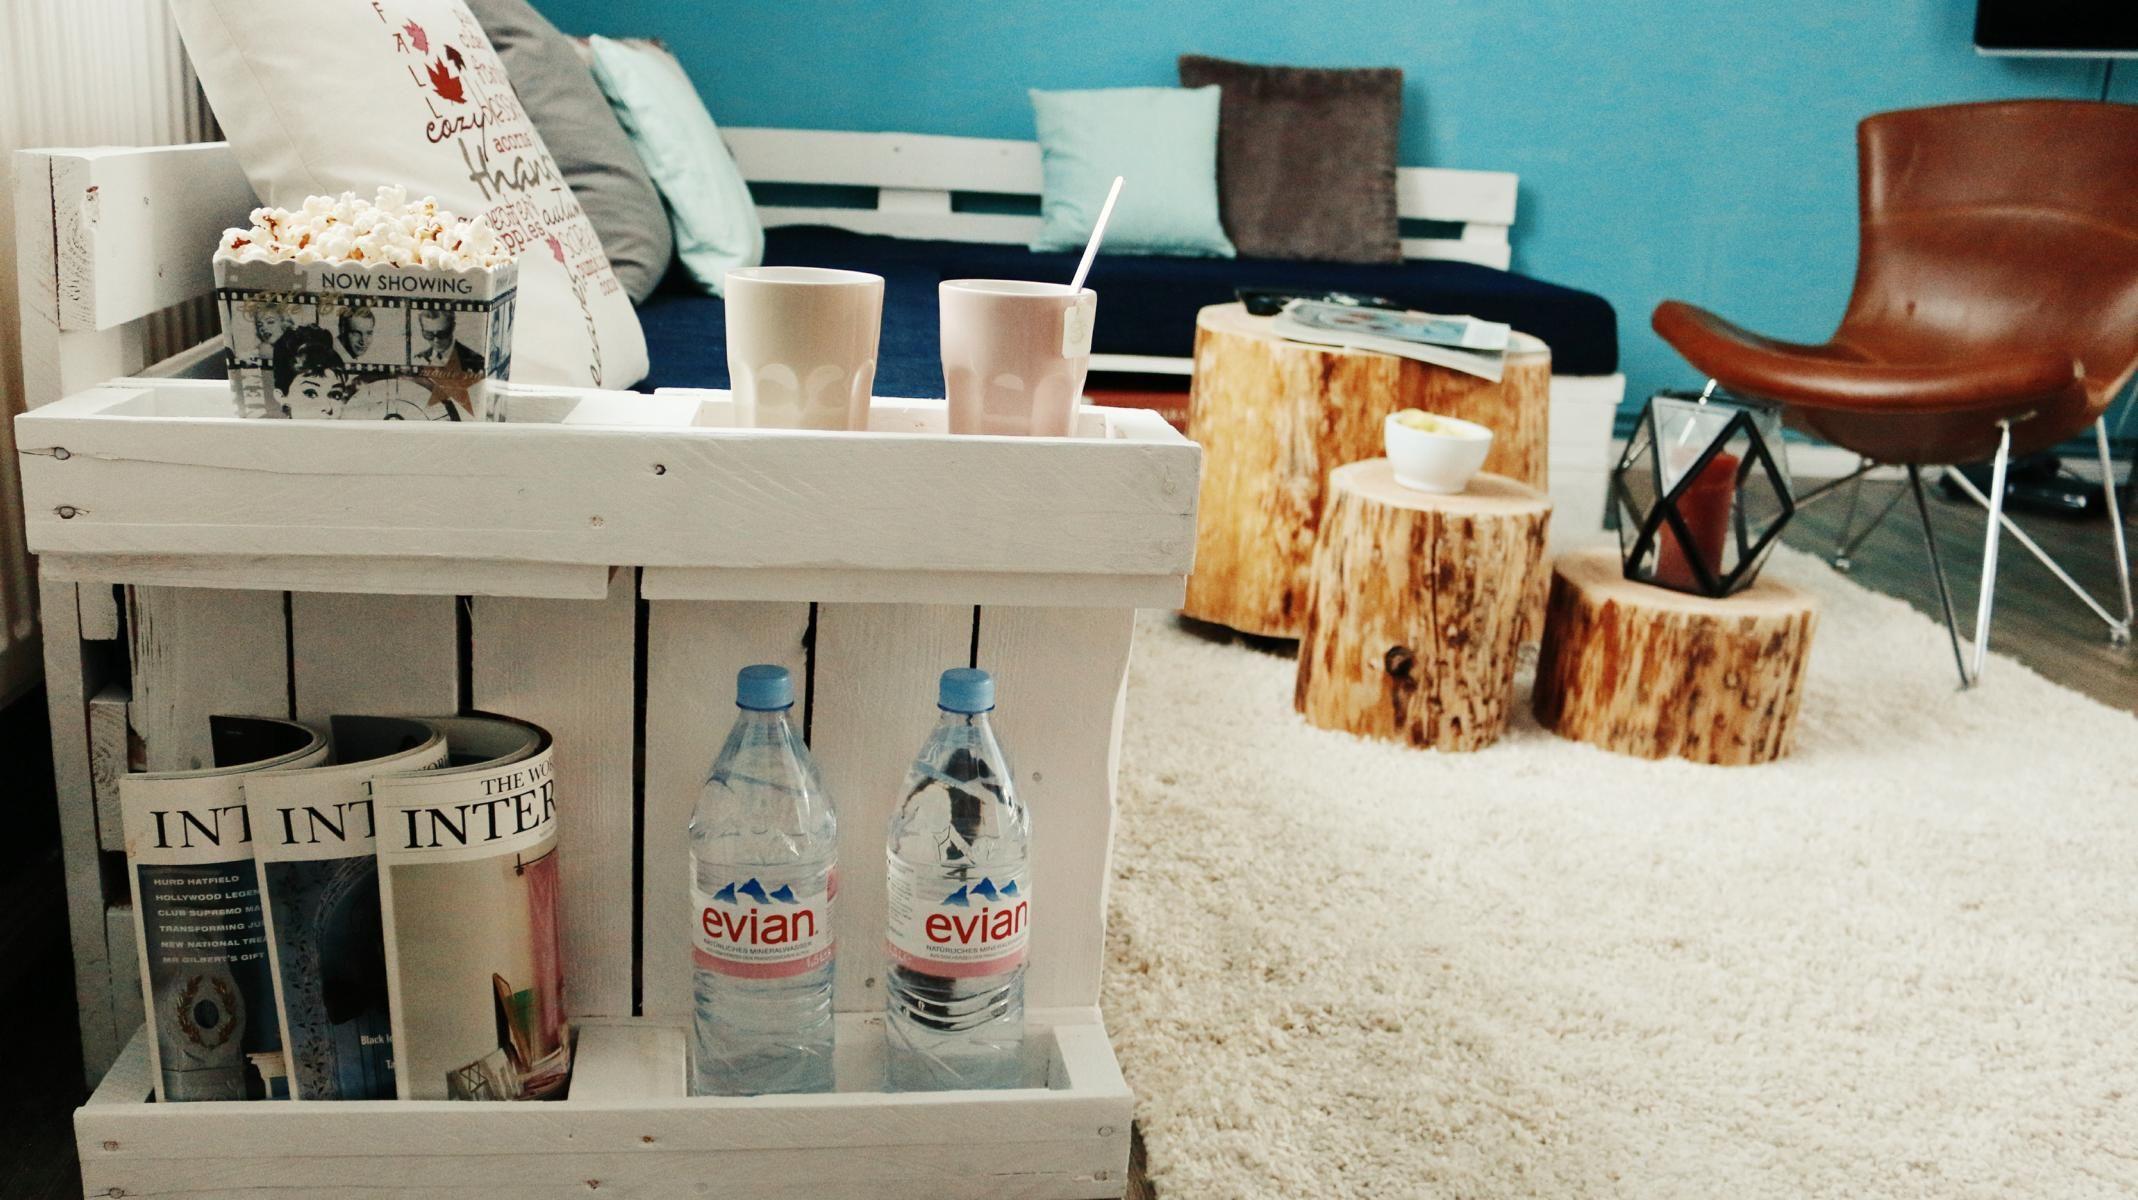 ᐅ sofa aus europaletten selber bauen & shop ᐅ palettensofa diy